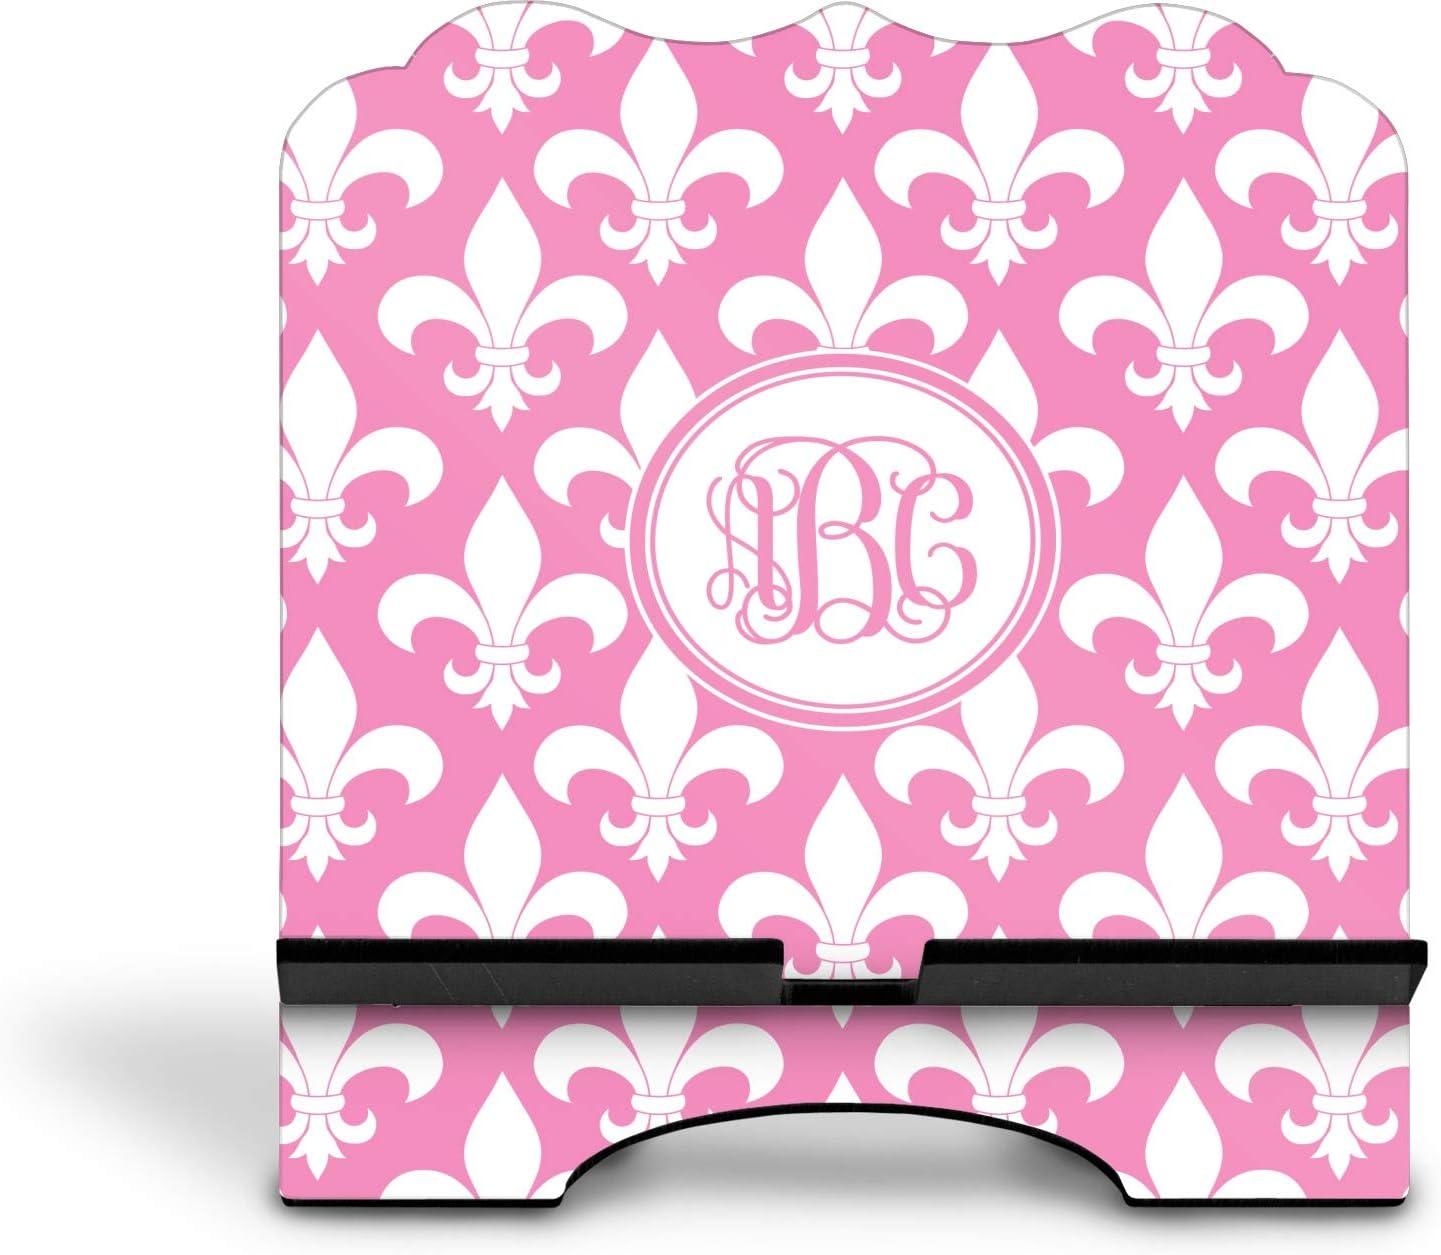 Personalized YouCustomizeIt Fleur De Lis Stylized Tablet Stand